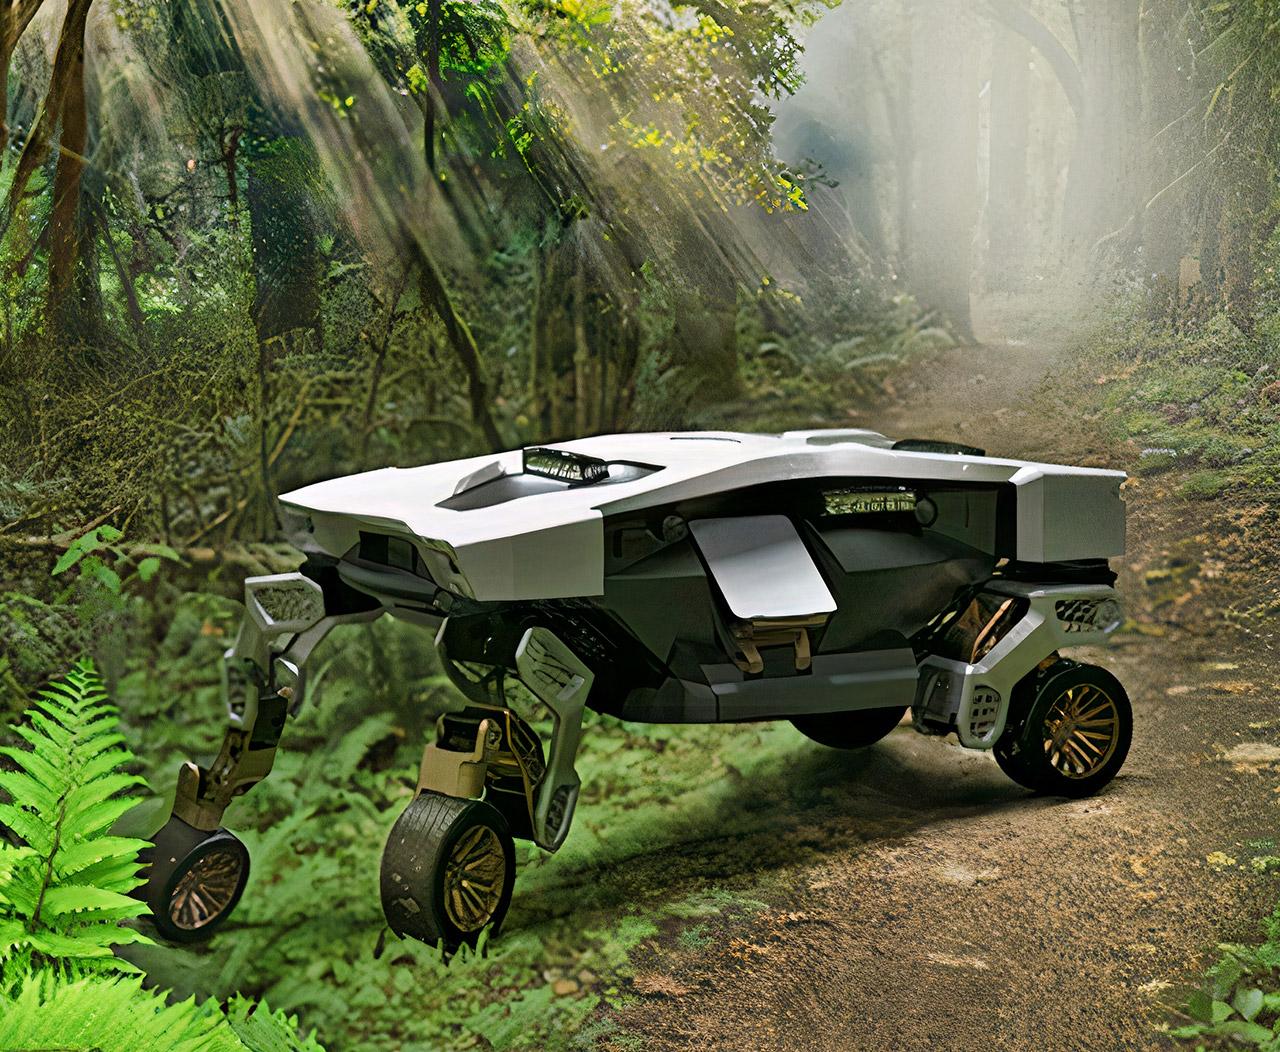 Hyundai TIGER Mobility Vehicle Concept